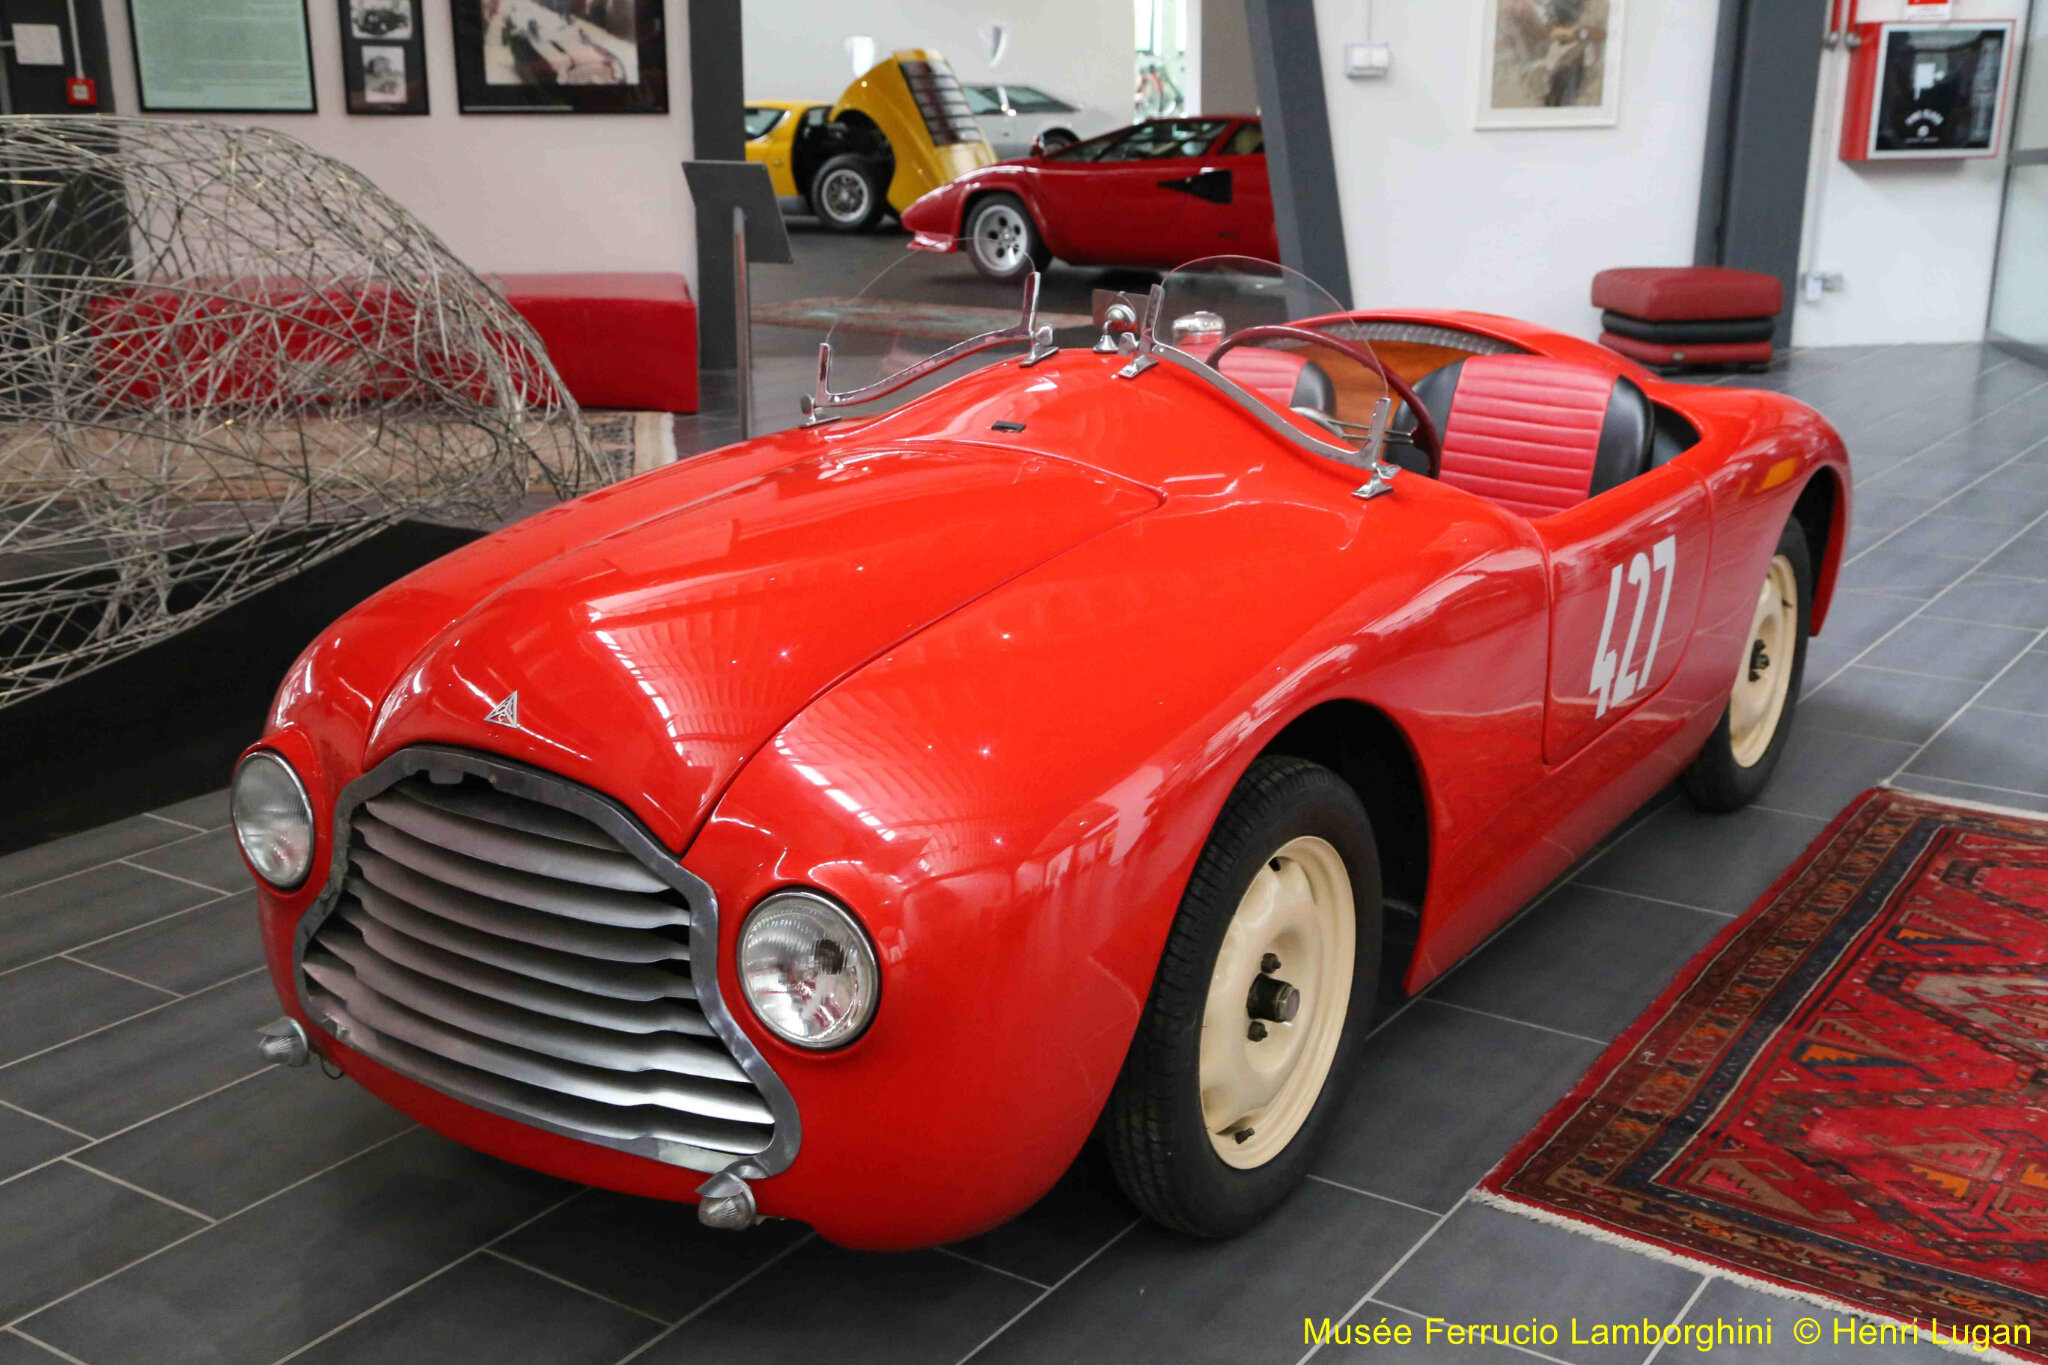 FLC (Lamborghini) Fiat 500_01 - 1948 [I] HL_GF